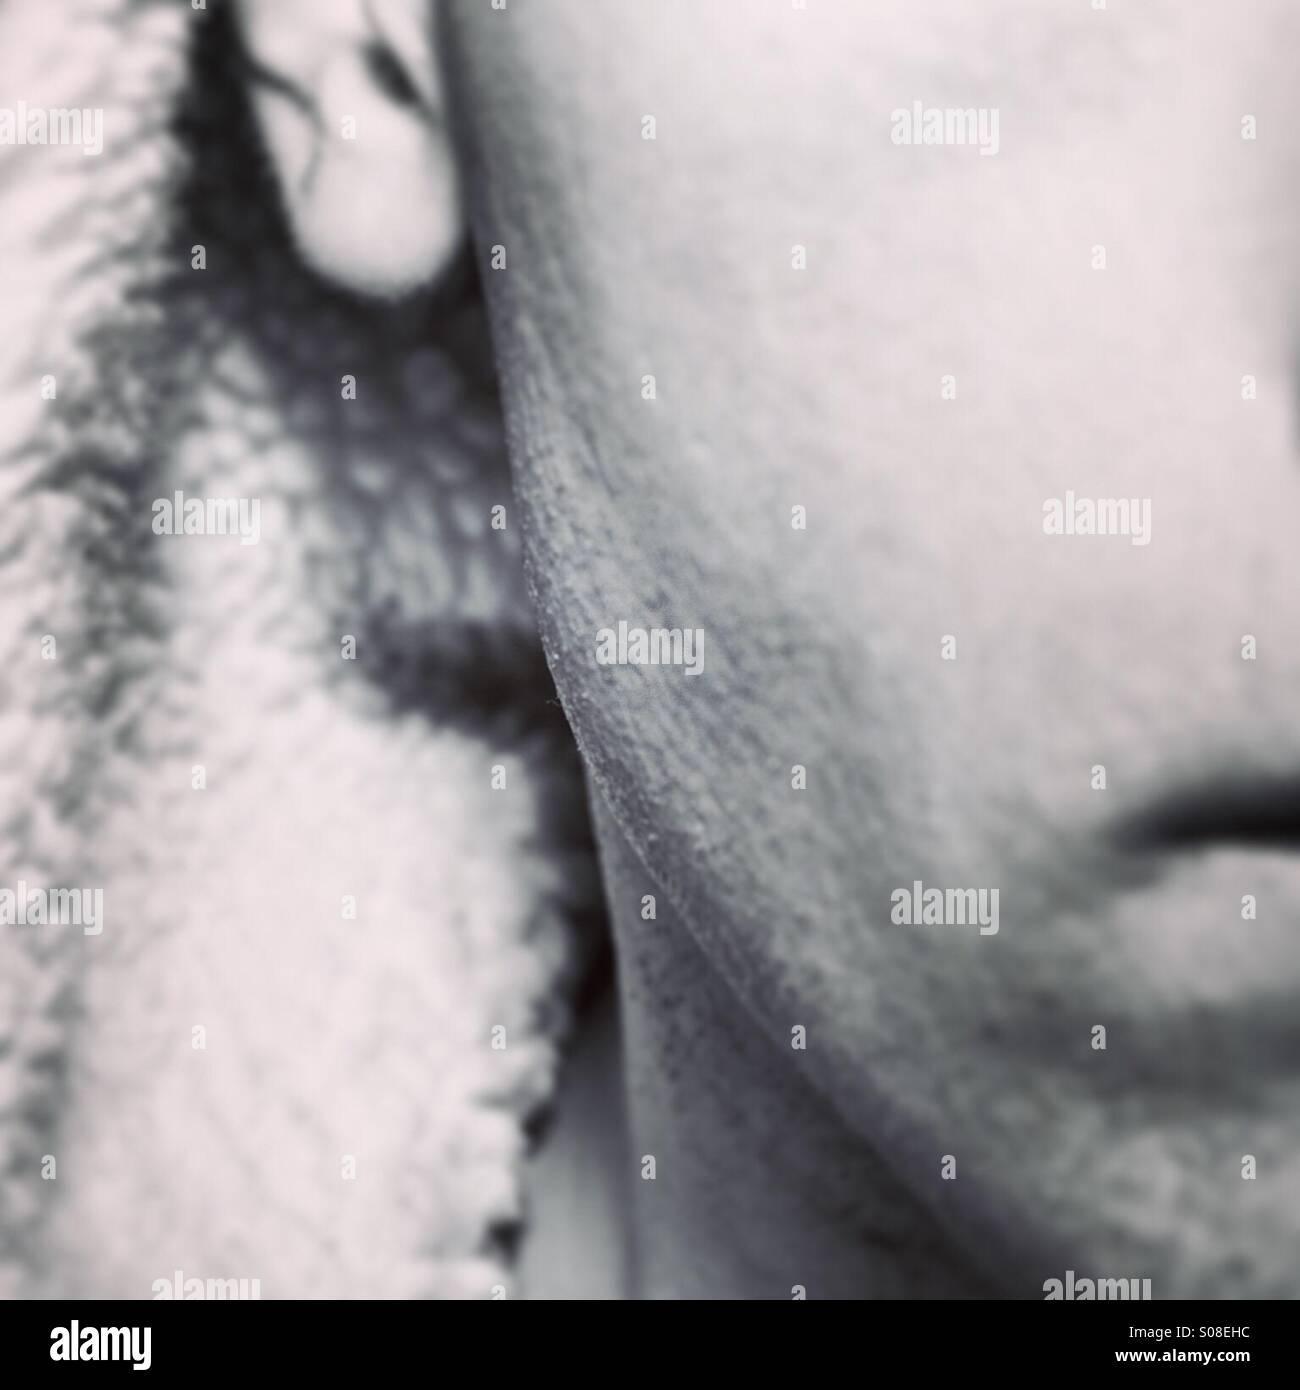 Cerrar el hueso de la mandíbula de hombres encapuchados Imagen De Stock